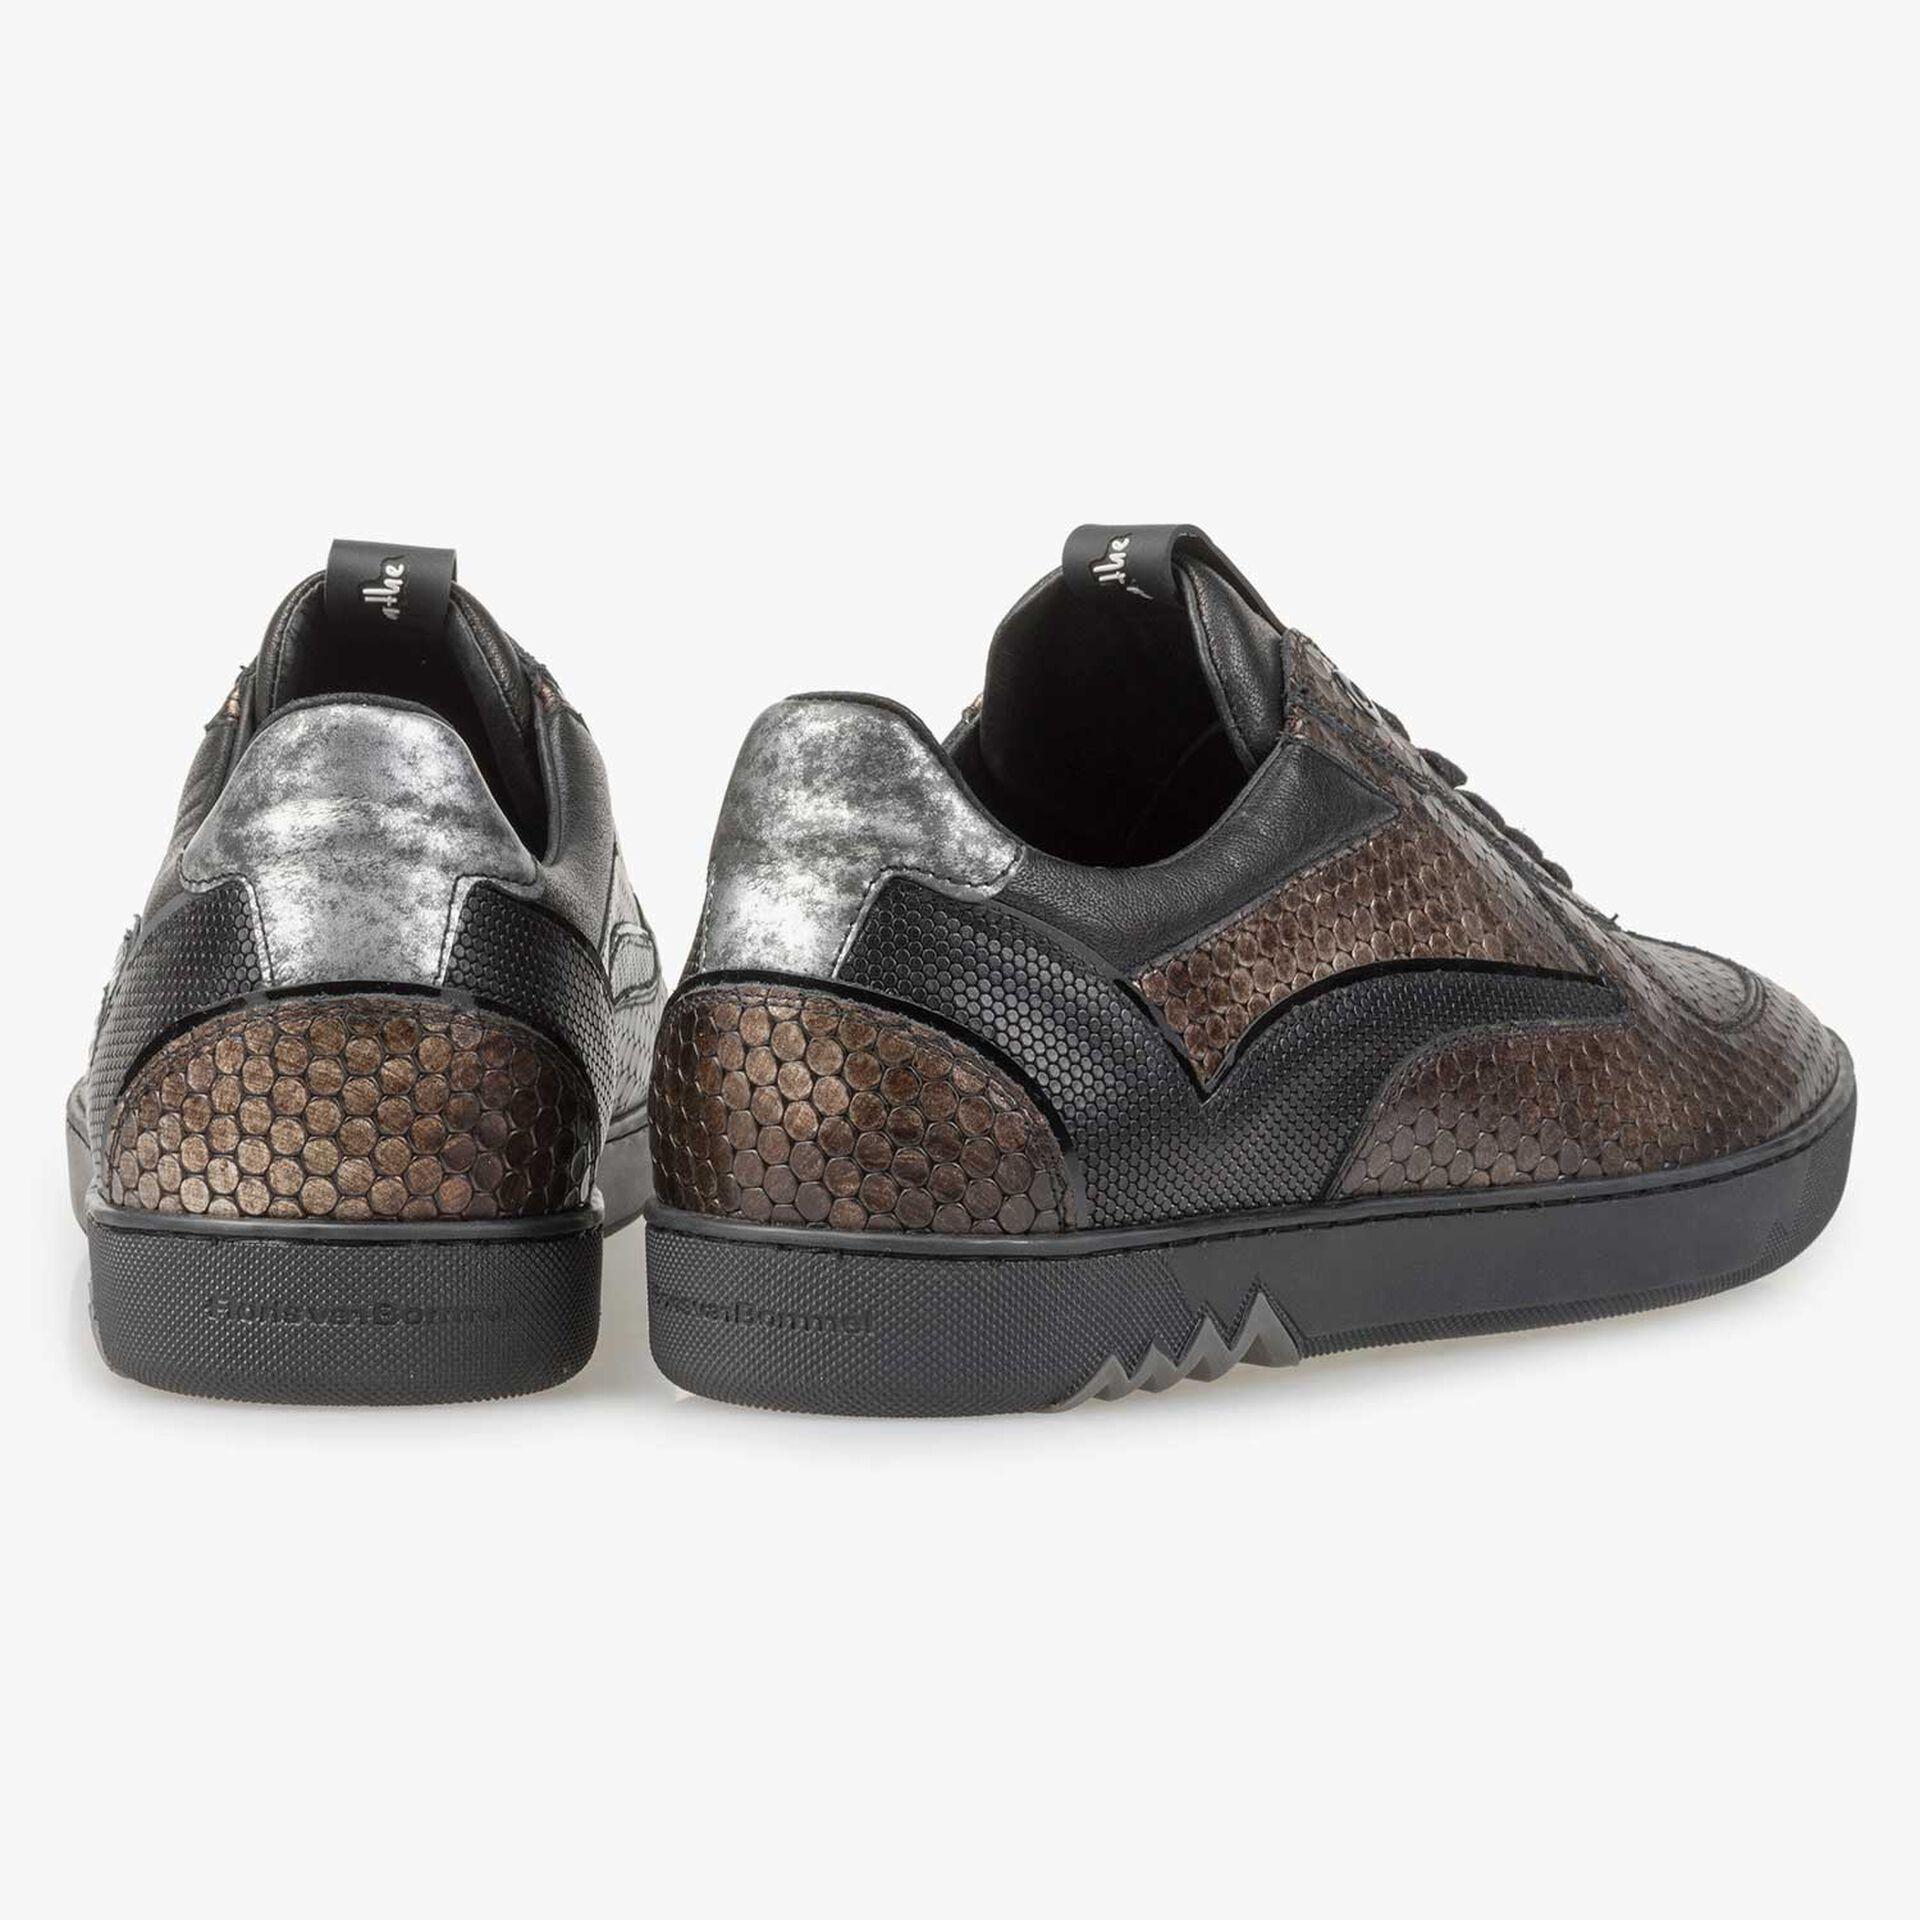 Brown leather sneaker with metallic print